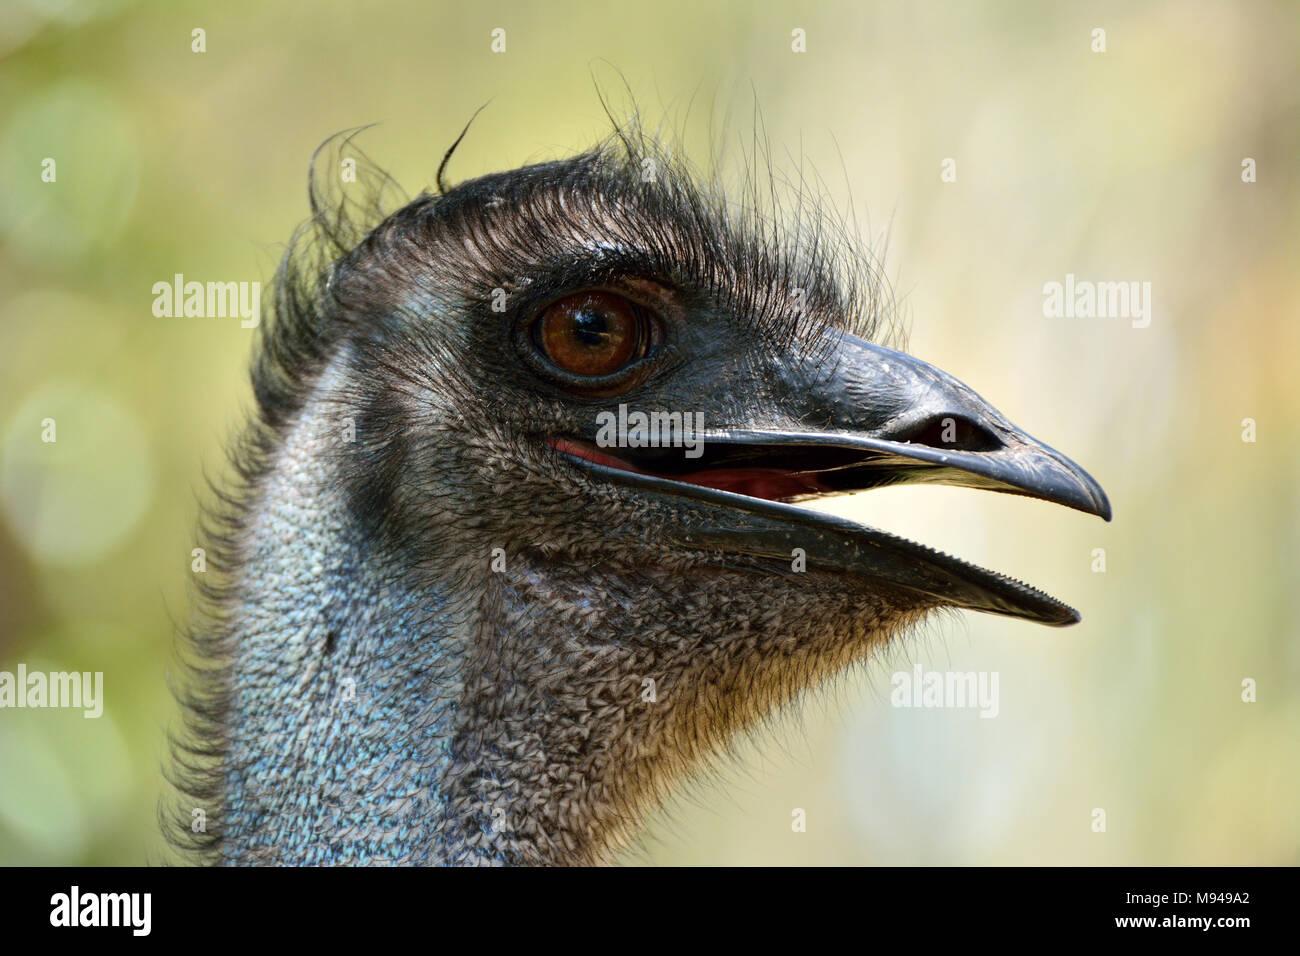 Head of emu bird (Dromaius novaehollandiae), the second-largest living bird by height. - Stock Image